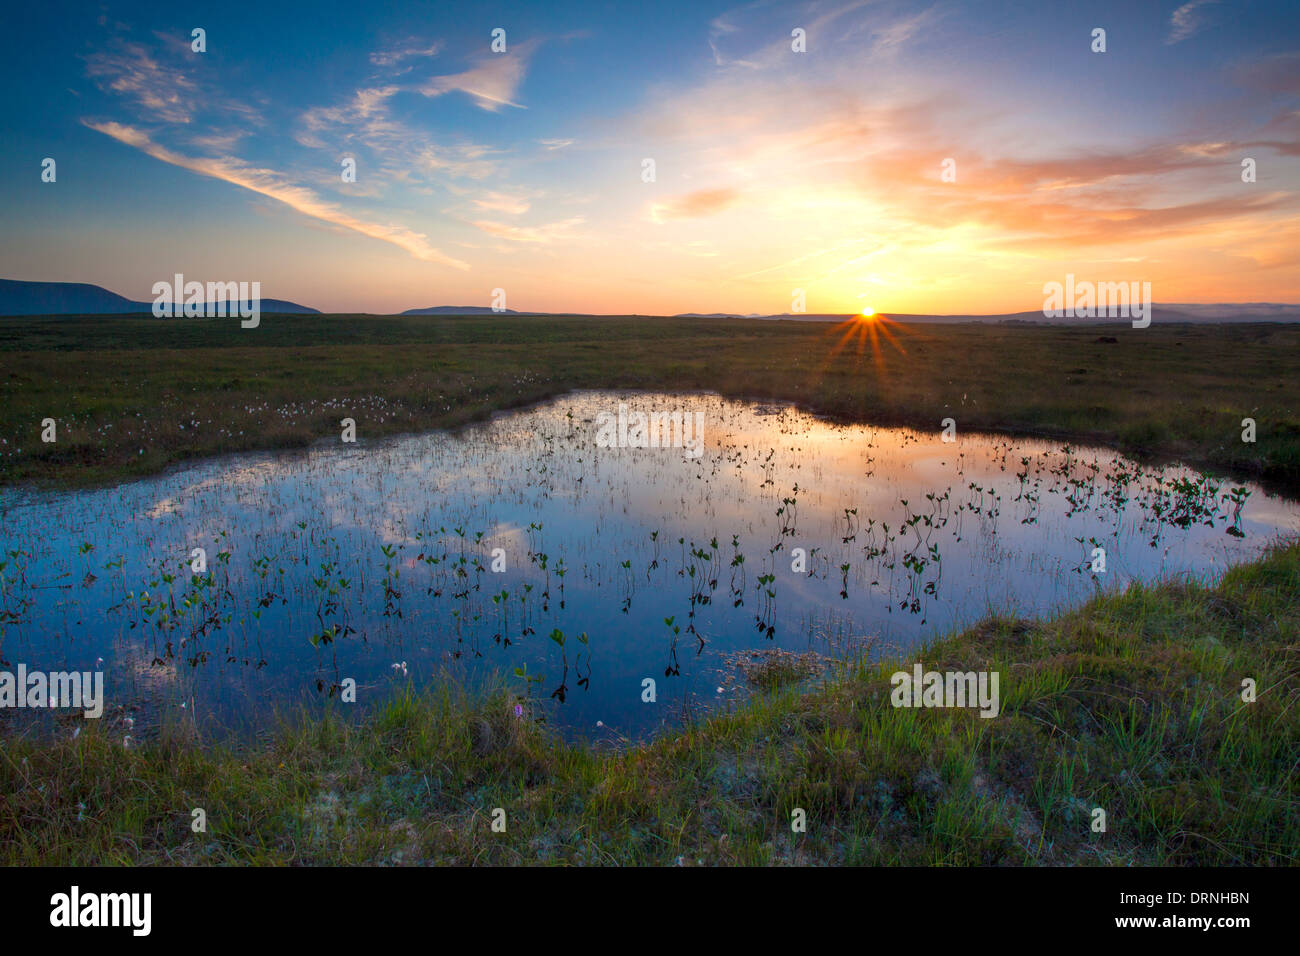 Moor-Pool Sonnenuntergang unter den Nephin Beg Bergen, Ballycroy National Park, County Mayo, Irland. Stockbild